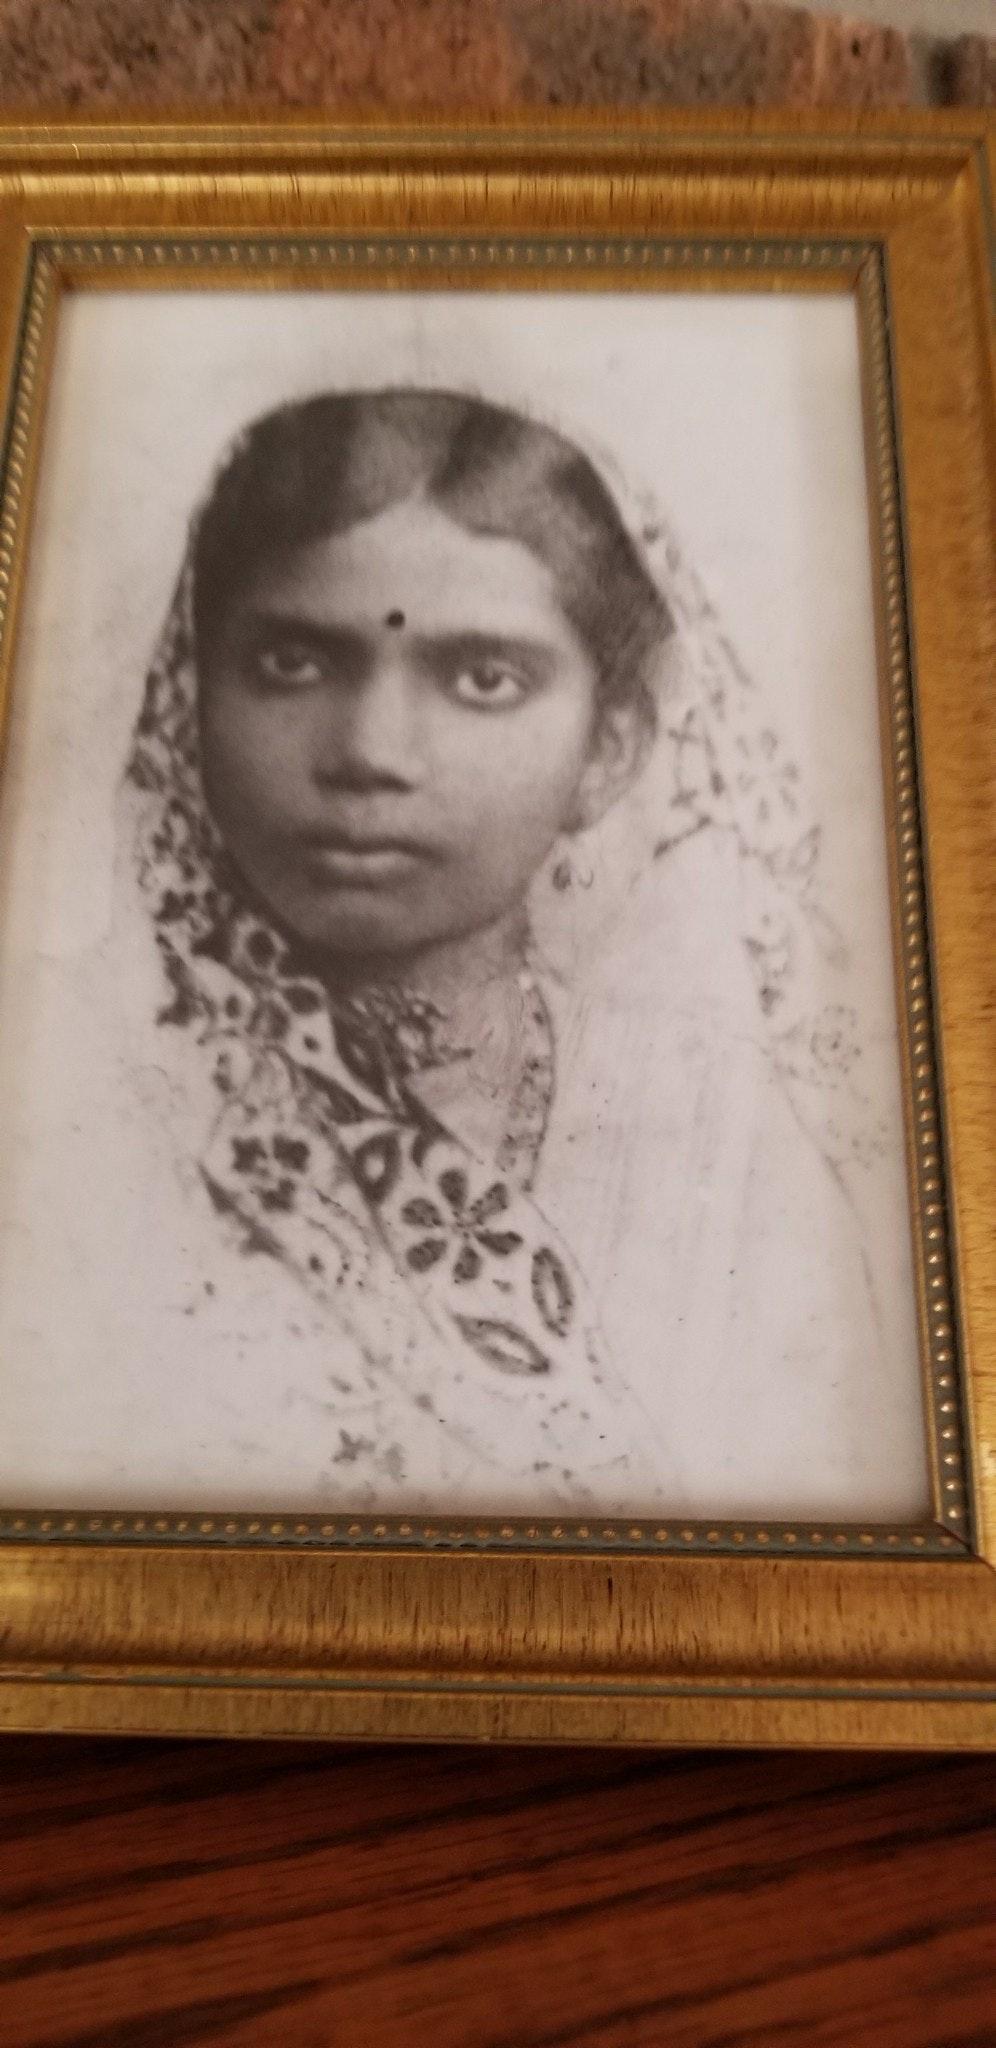 Black & White photo with gold frame of Manisha Sinha's grandmother, Radha Sinha